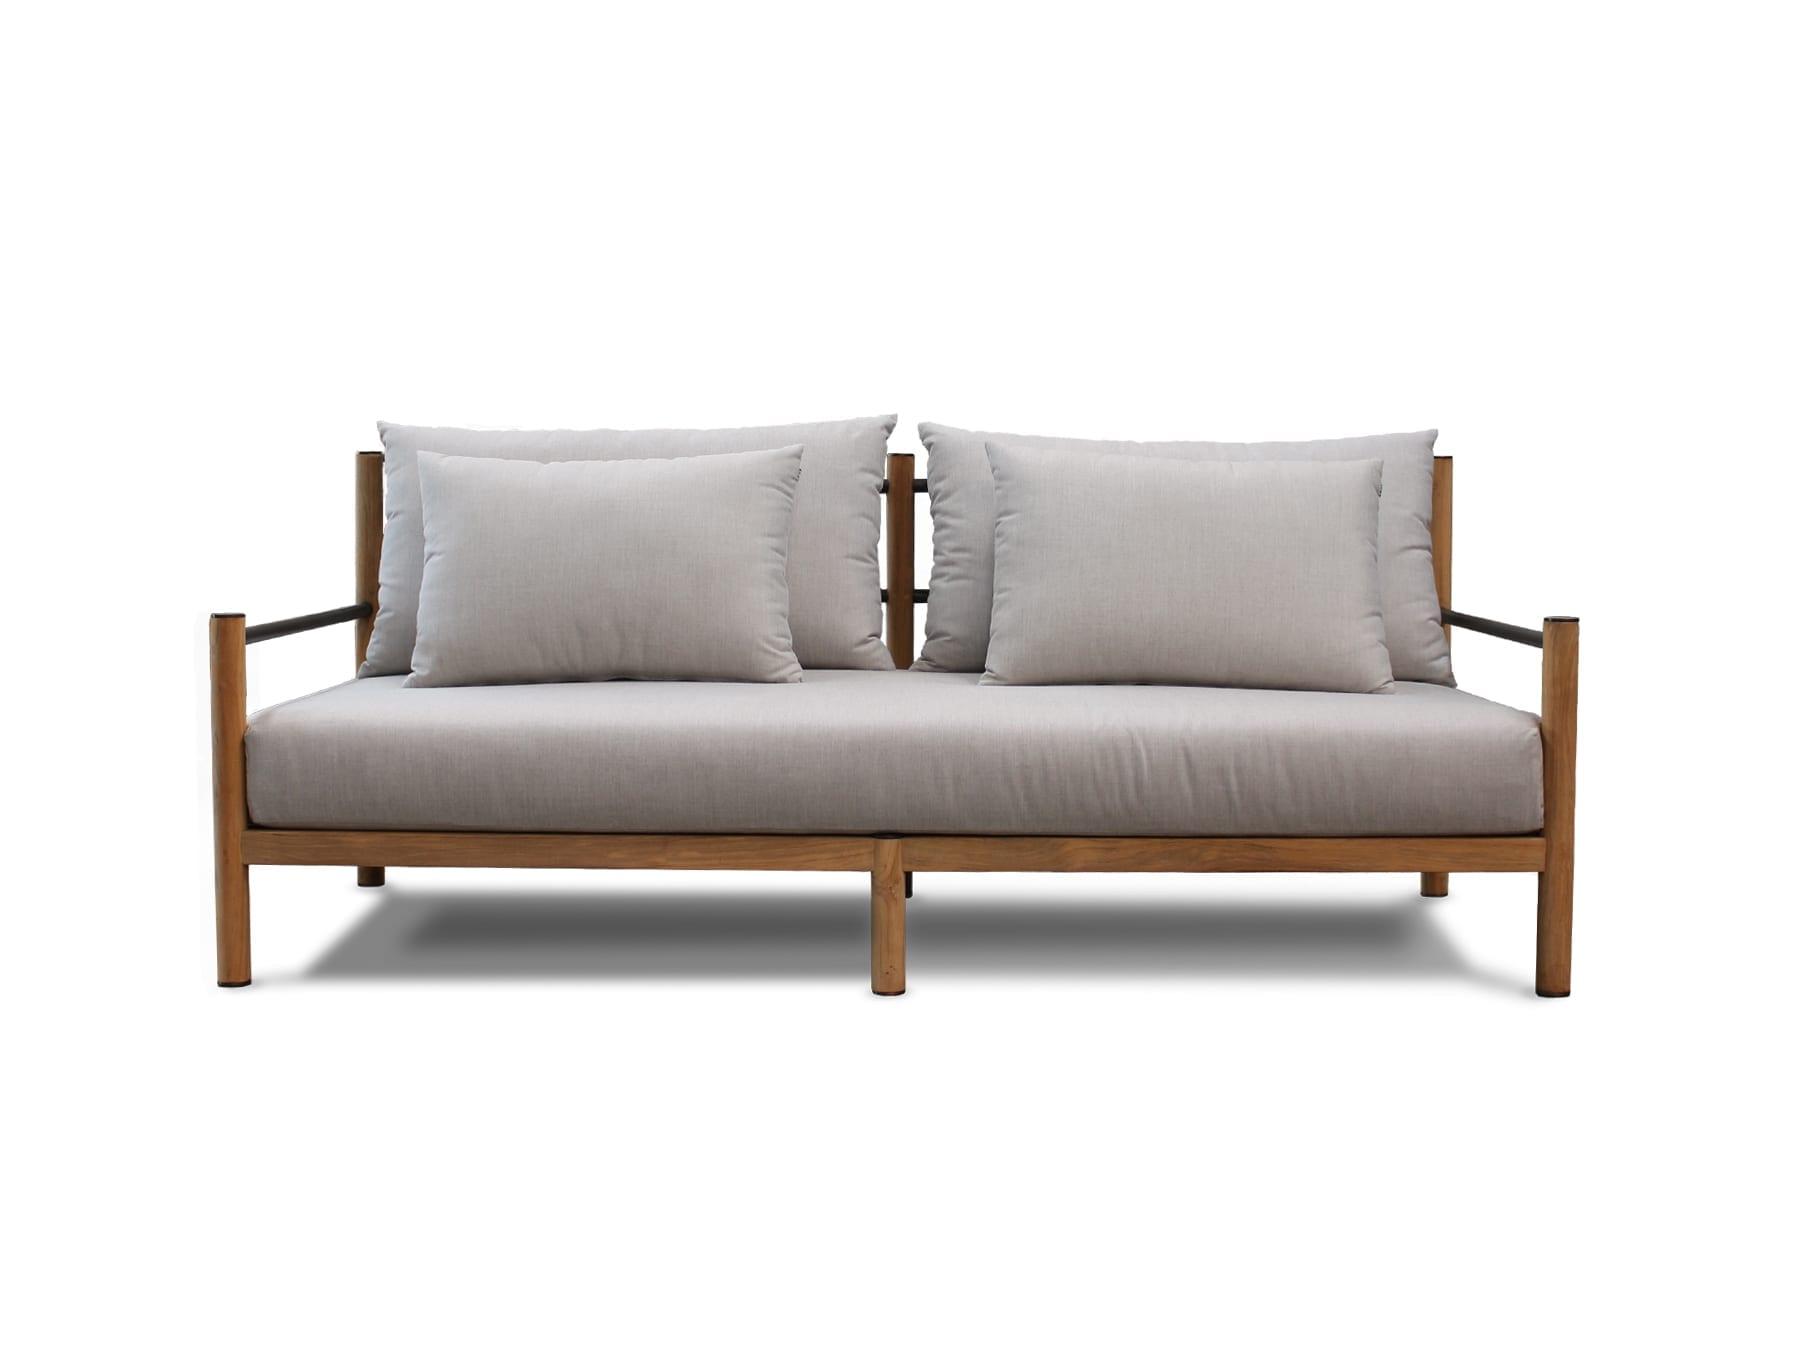 Cove Alexander 3 Seater Sofa